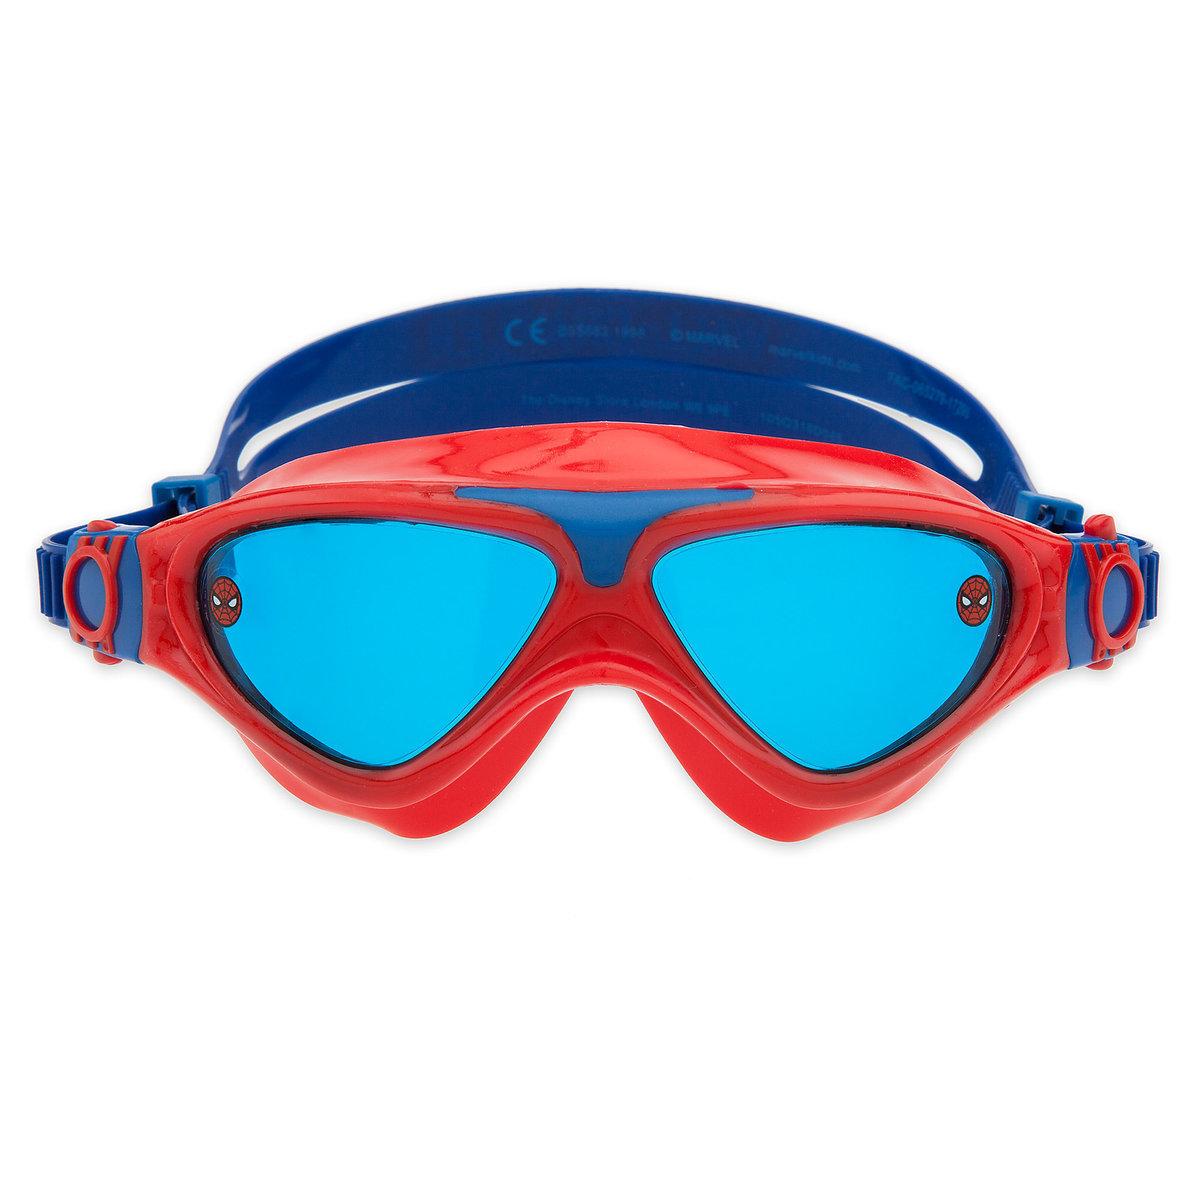 0492d7fd4ce SOLD  H6161 Spider-Man Swim Goggles for Kids – HiKiddy.com